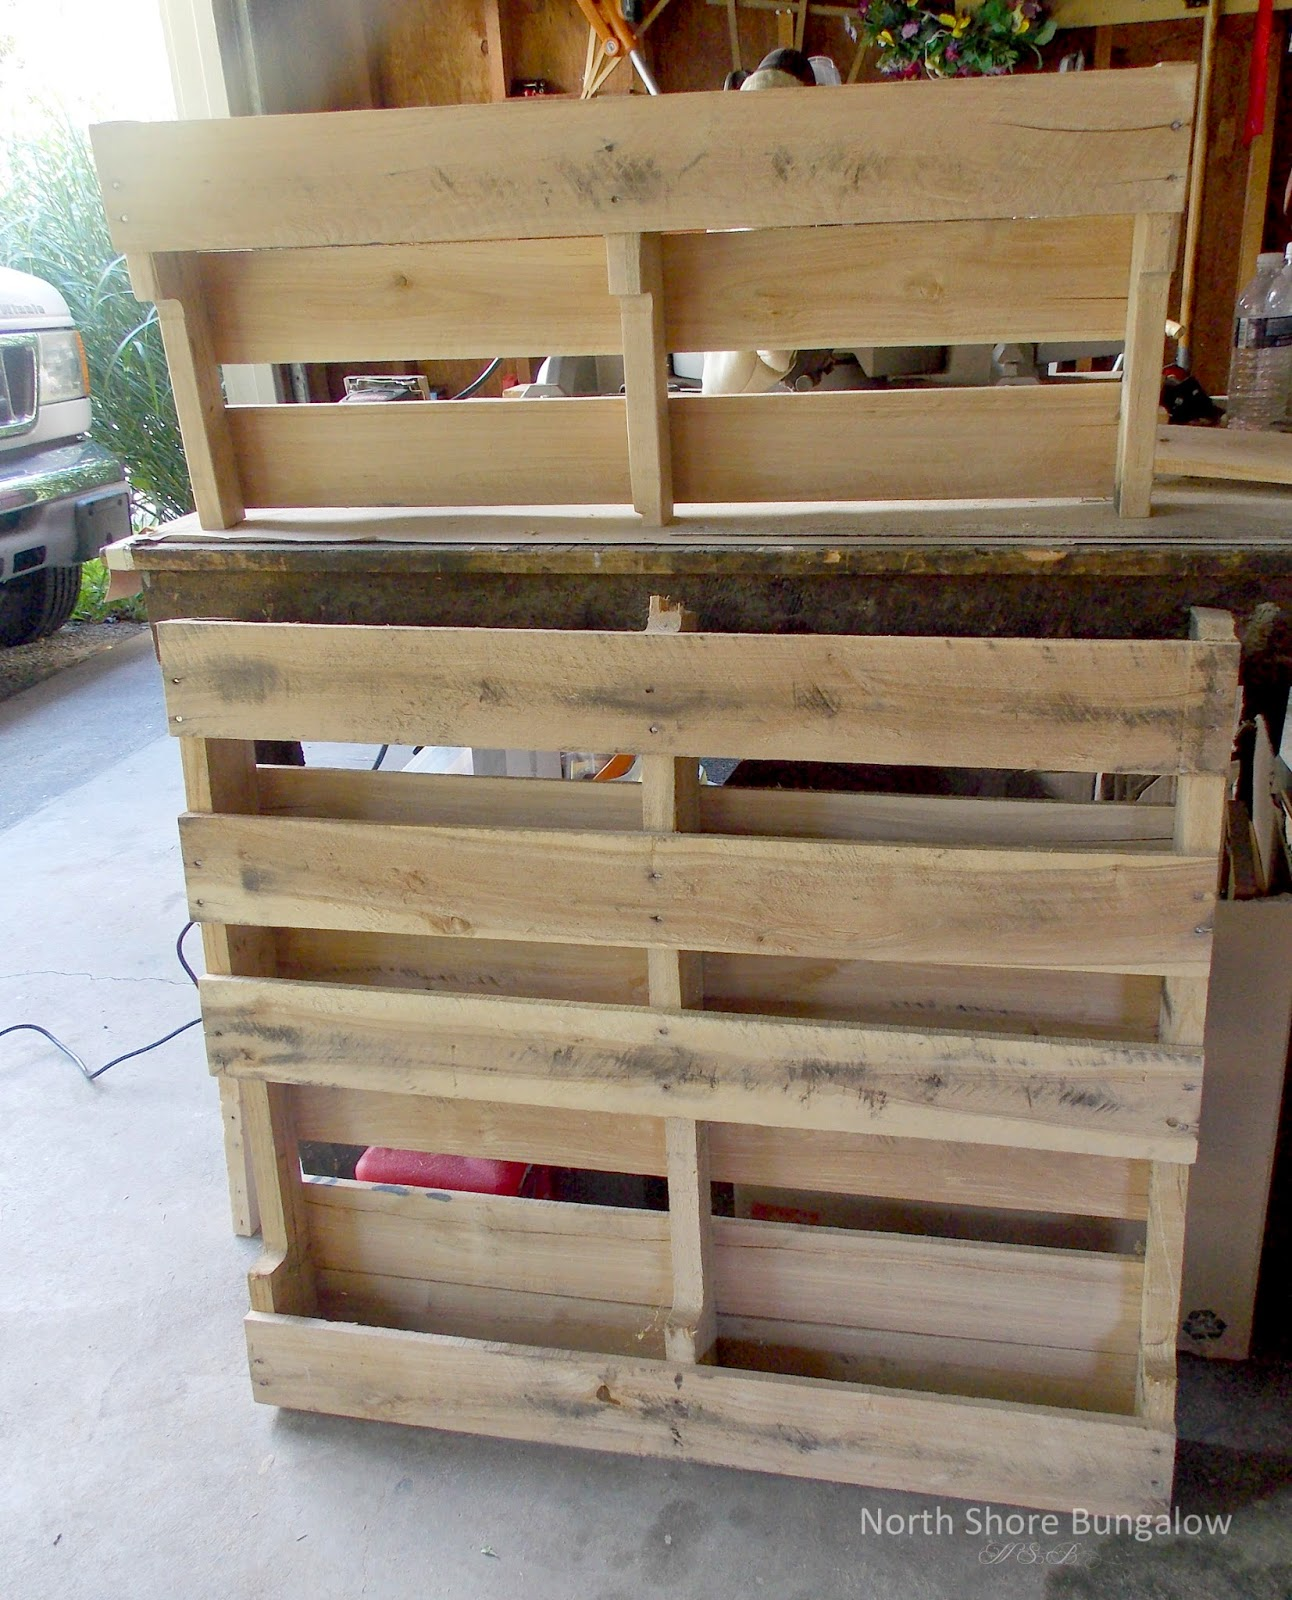 North Shore Bungalow: DIY Wood Pallet Coat Rack